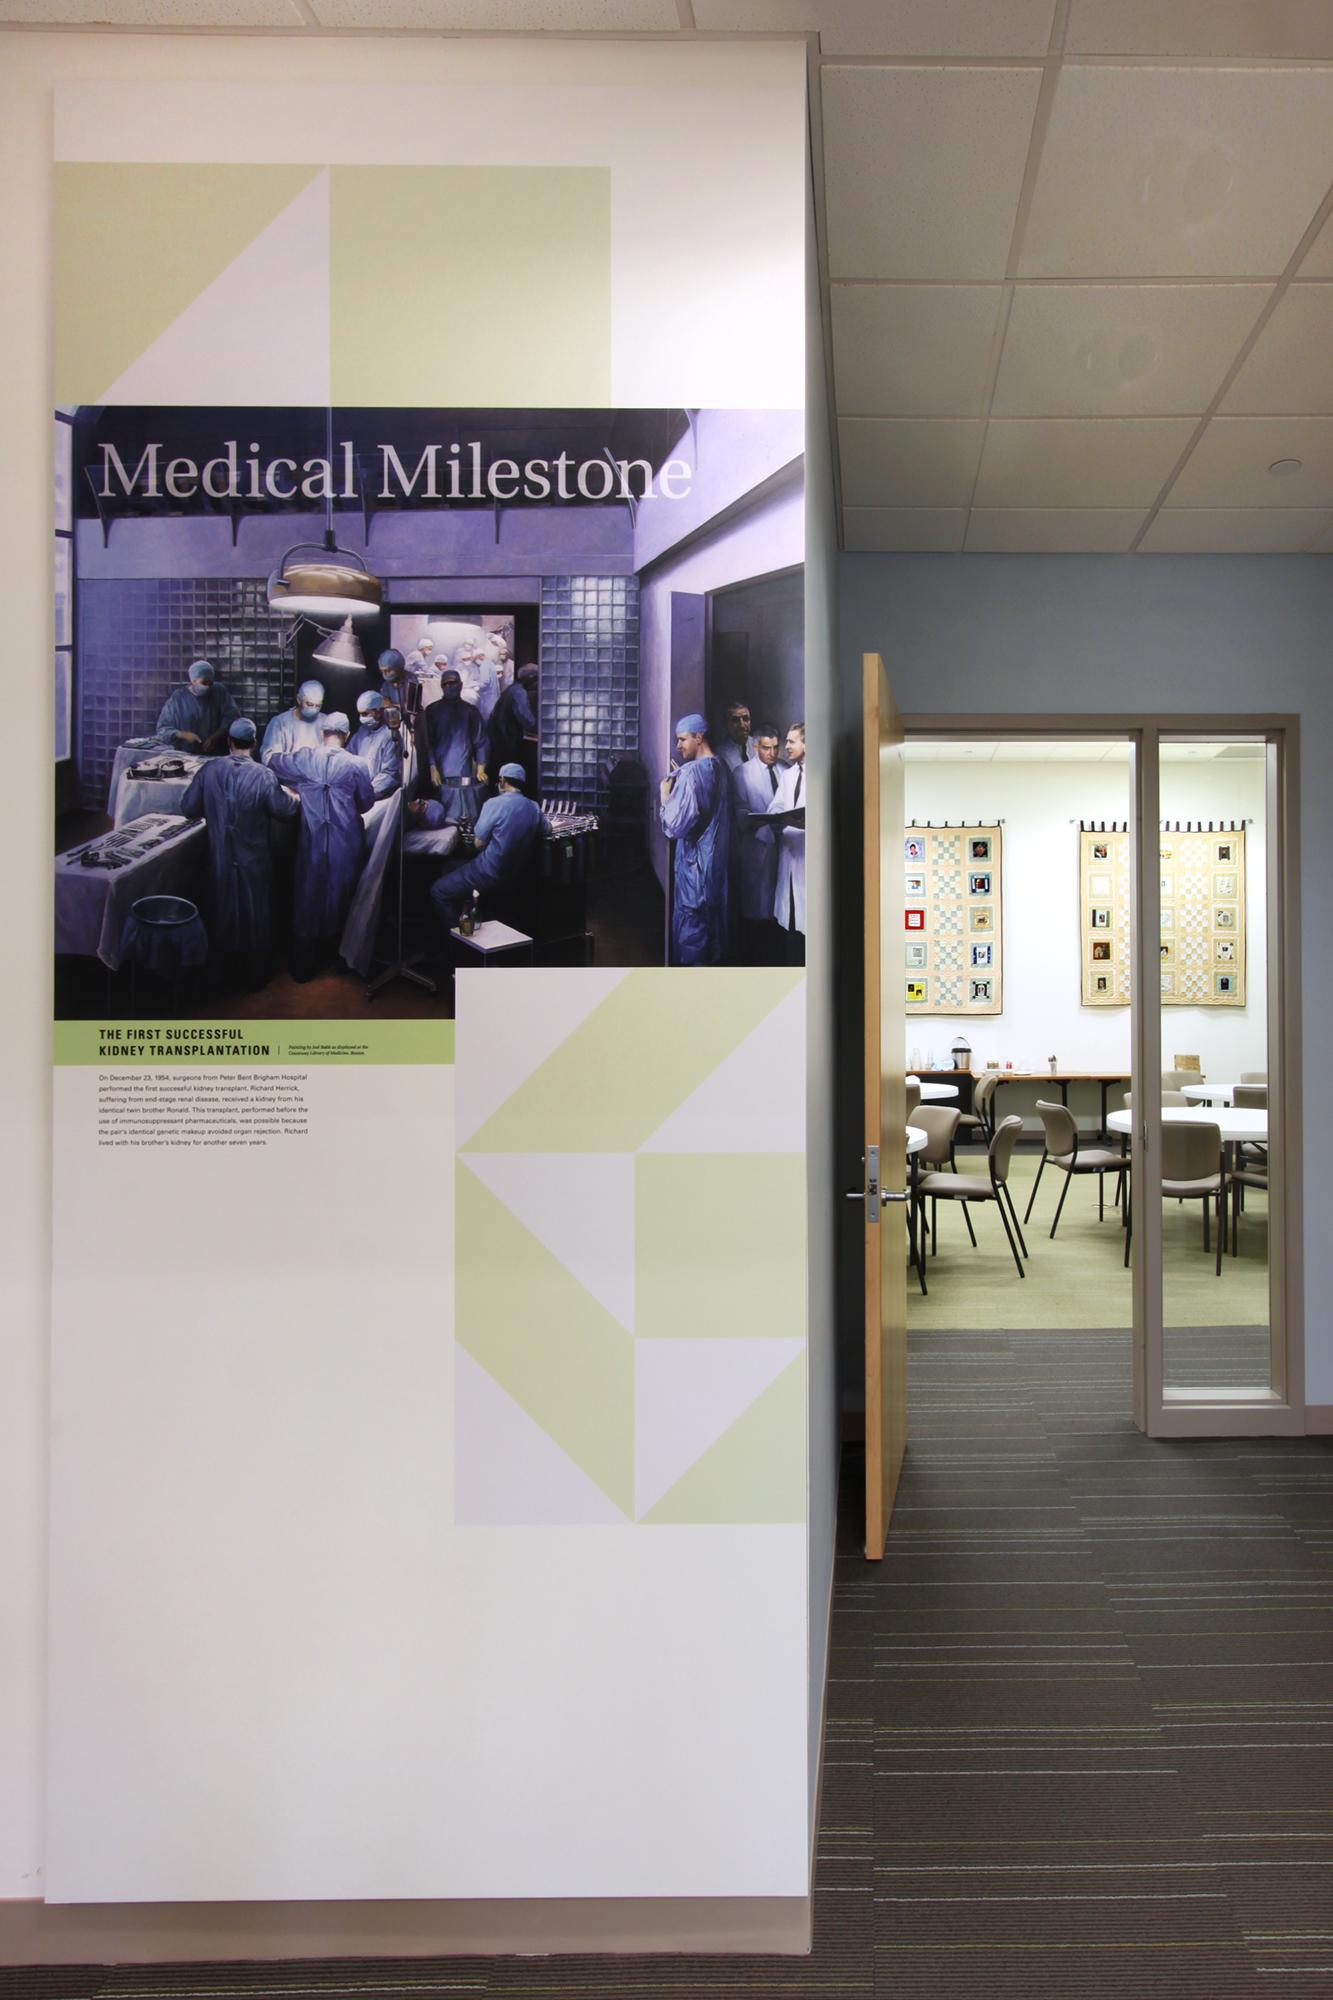 Medical_Milestone.jpg